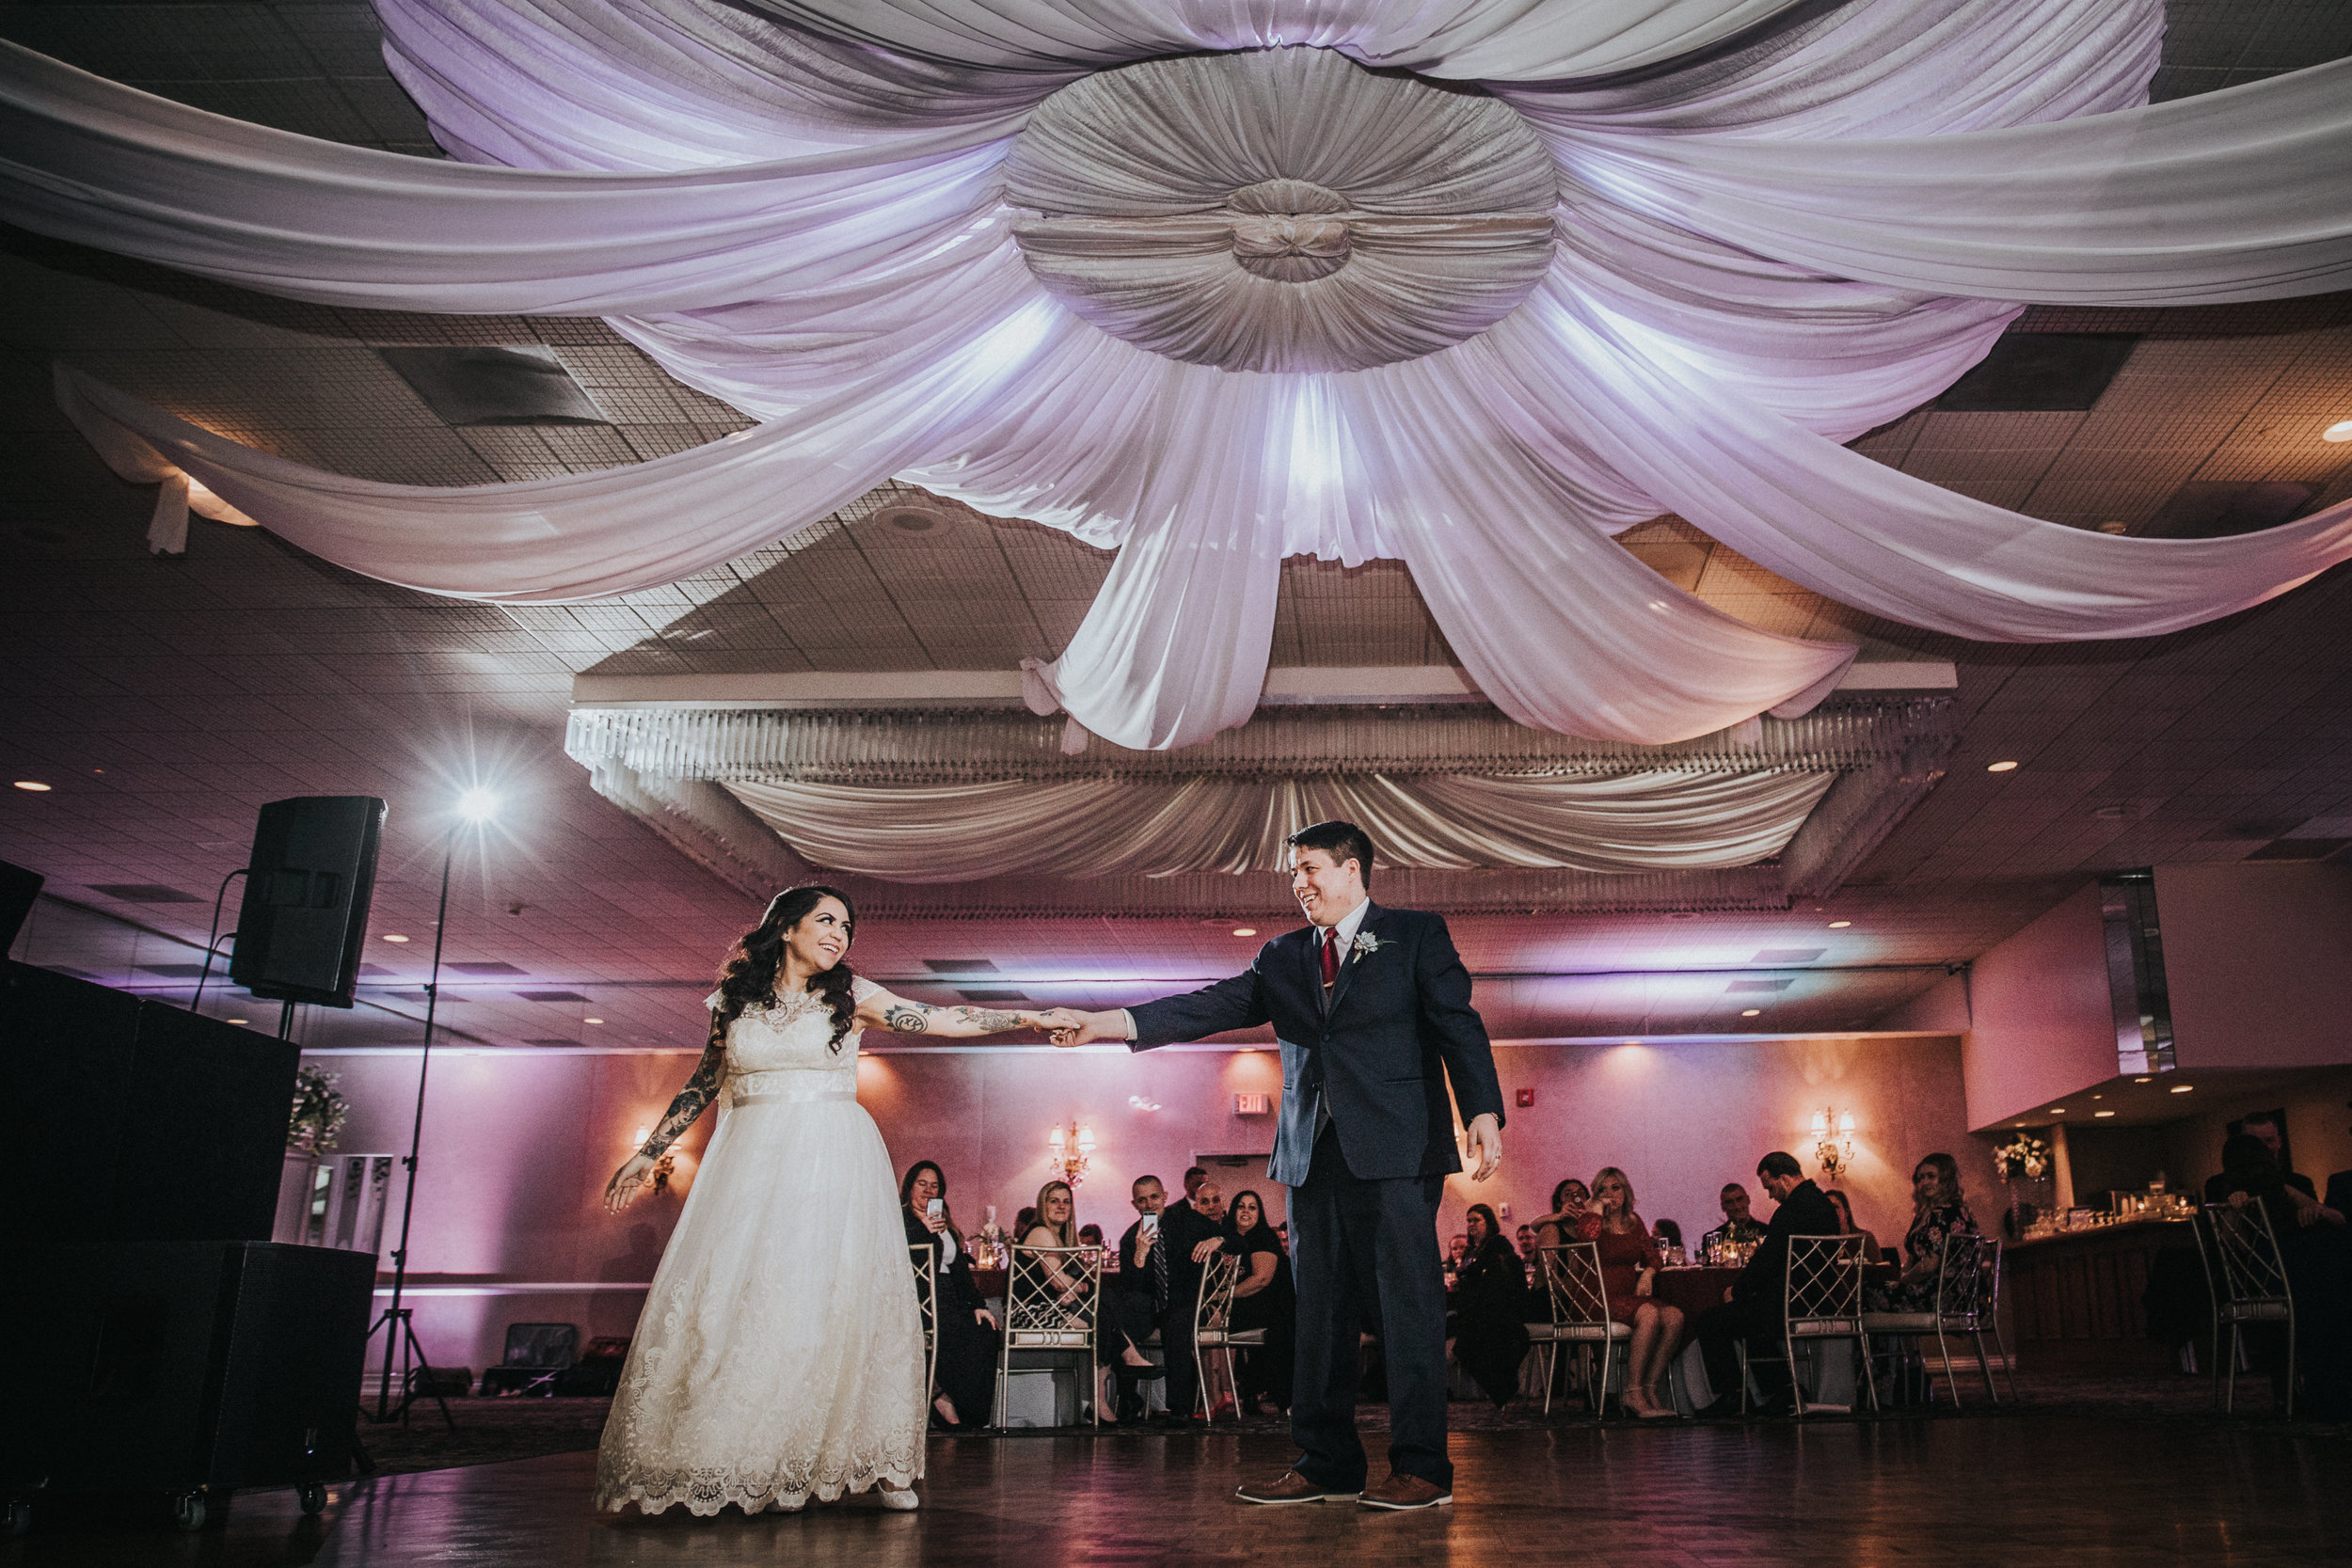 New-Jersey-Wedding-Photographer-ReceptionCenter-Valeria&Mike-Reception (73 of 265).jpg